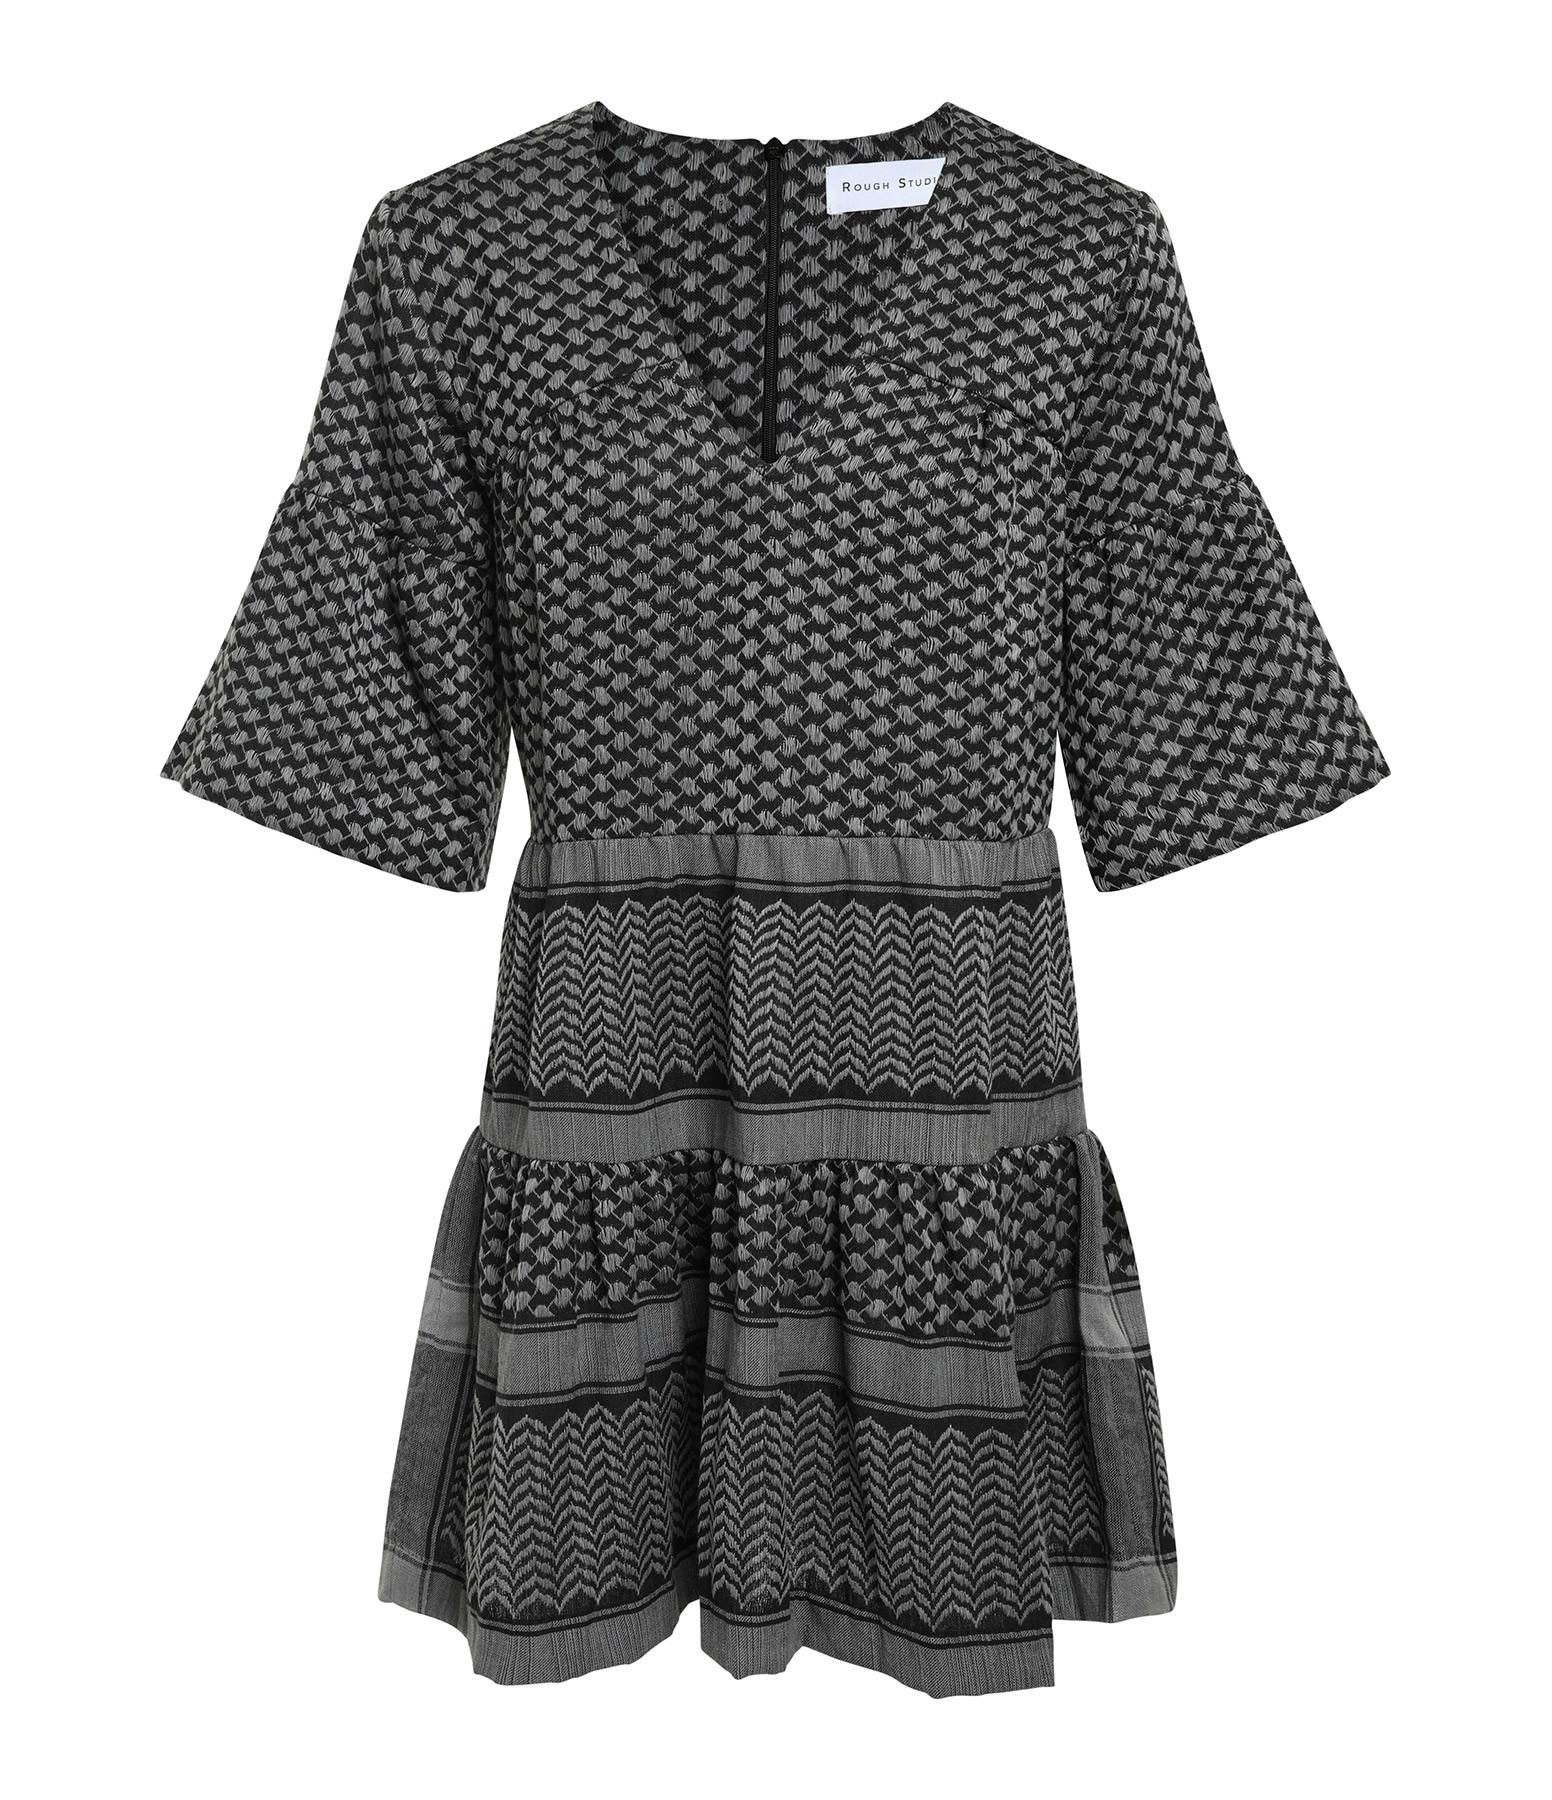 ROUGH STUDIOS - Robe Siena Coton Gris Noir